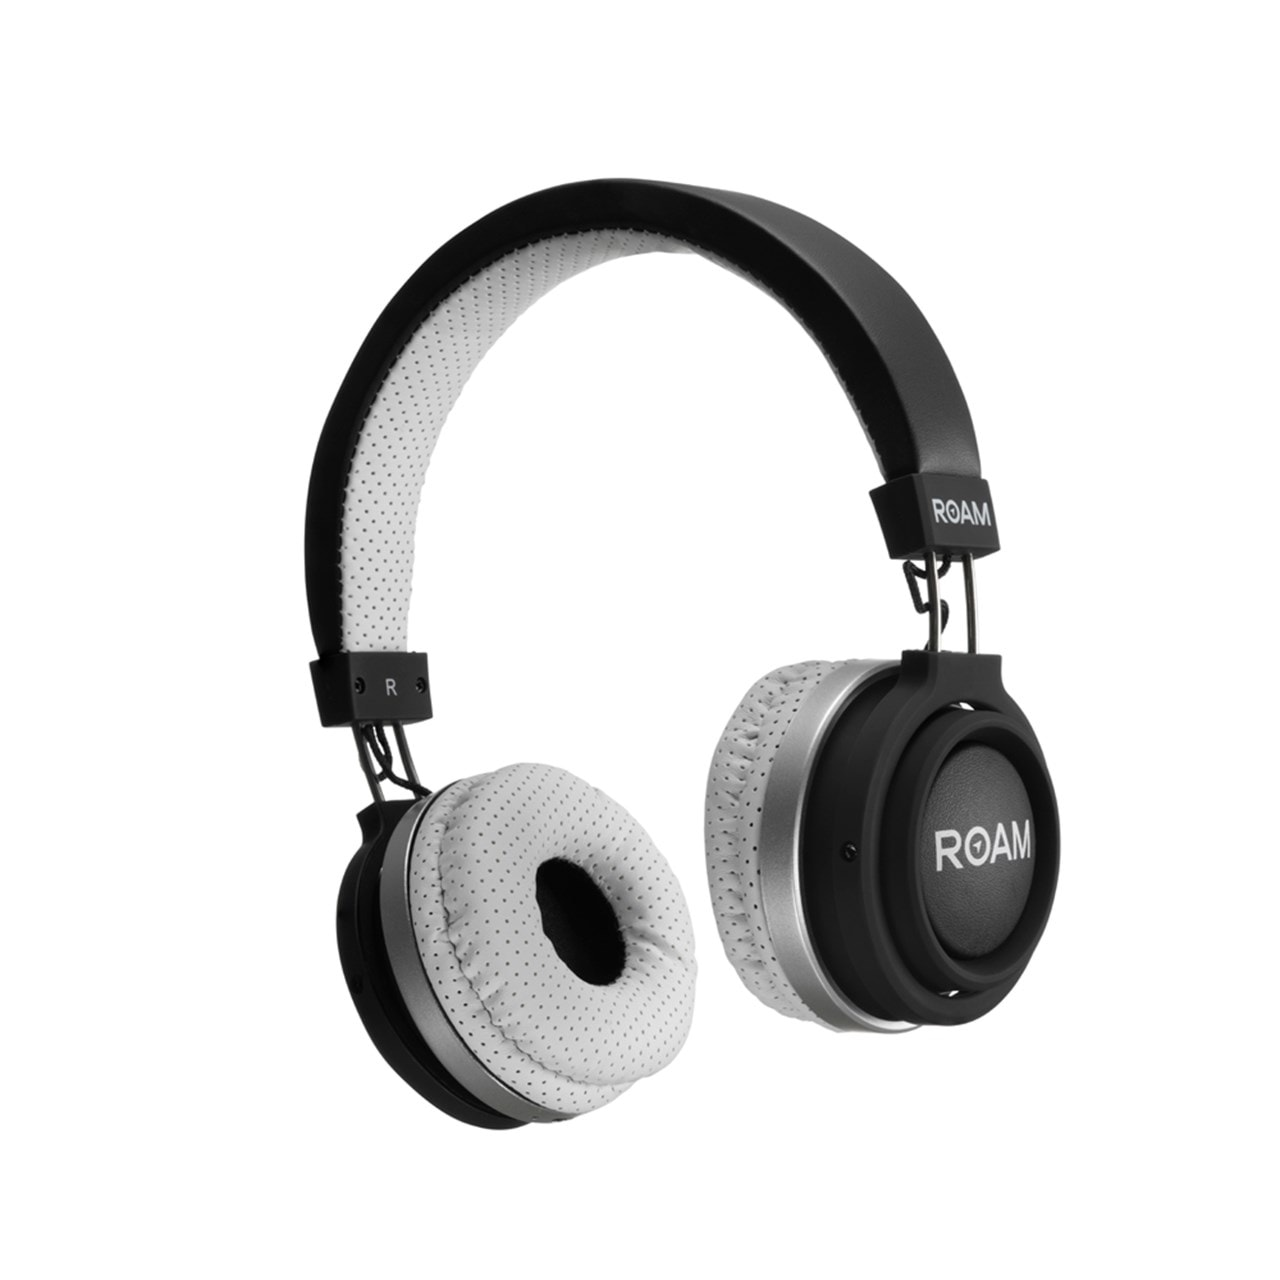 Roam Sport White Bluetooth Headphones (hmv Exclusive) - 1